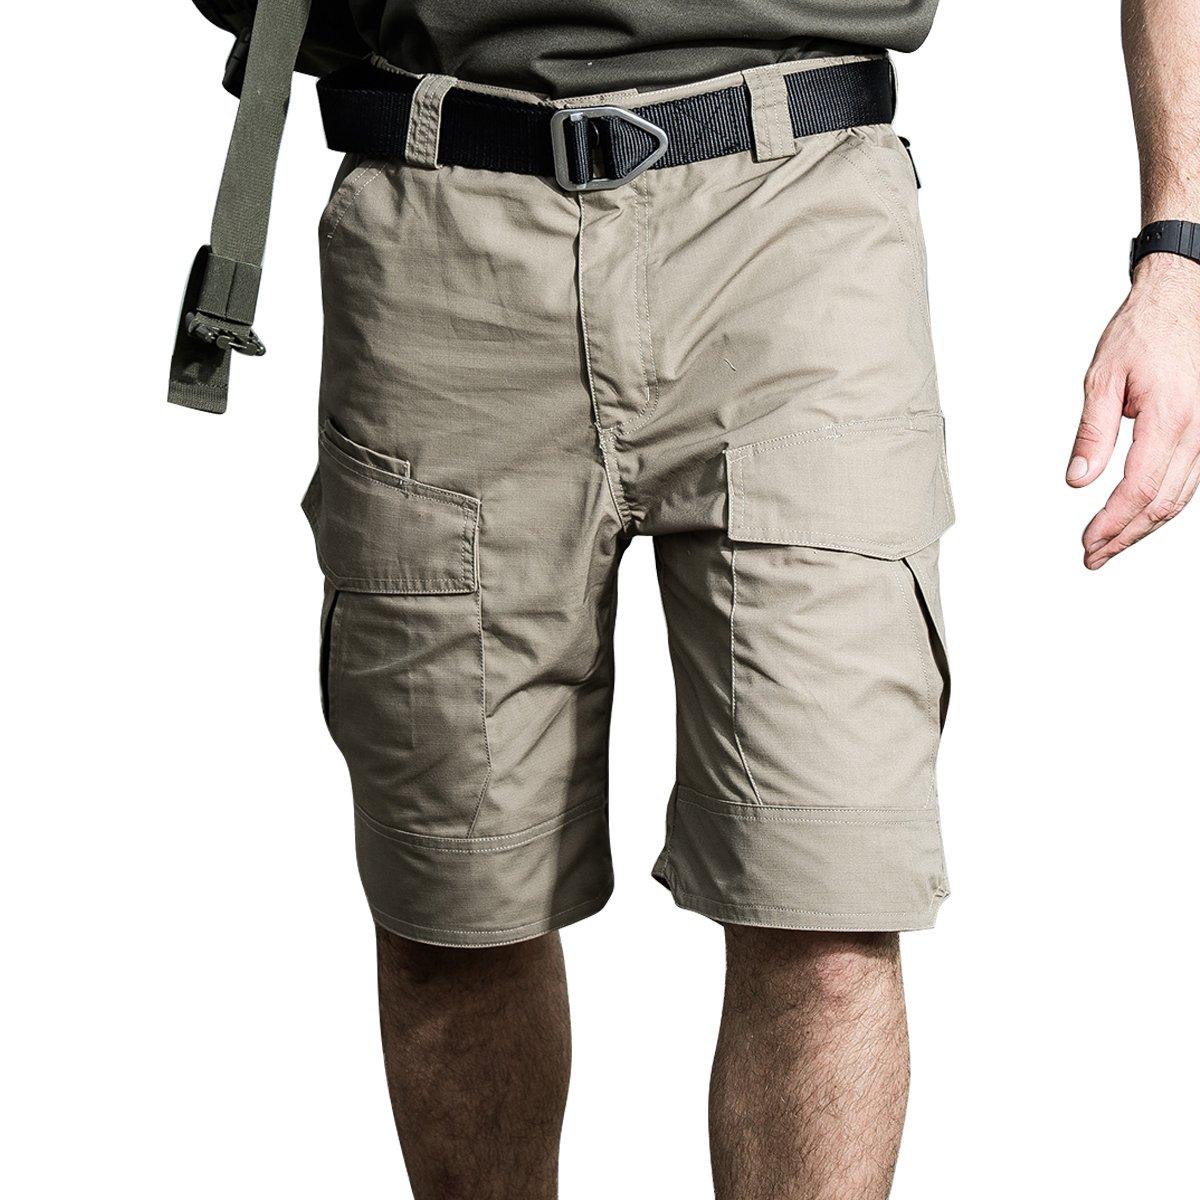 Men's Cargo Shorts Casual Ranch Work Hiking Military Army Tactical Slim Loose Fit Elastic Waistline Waterproof Multi Pocket Mechanic (Khaki, XXXL)